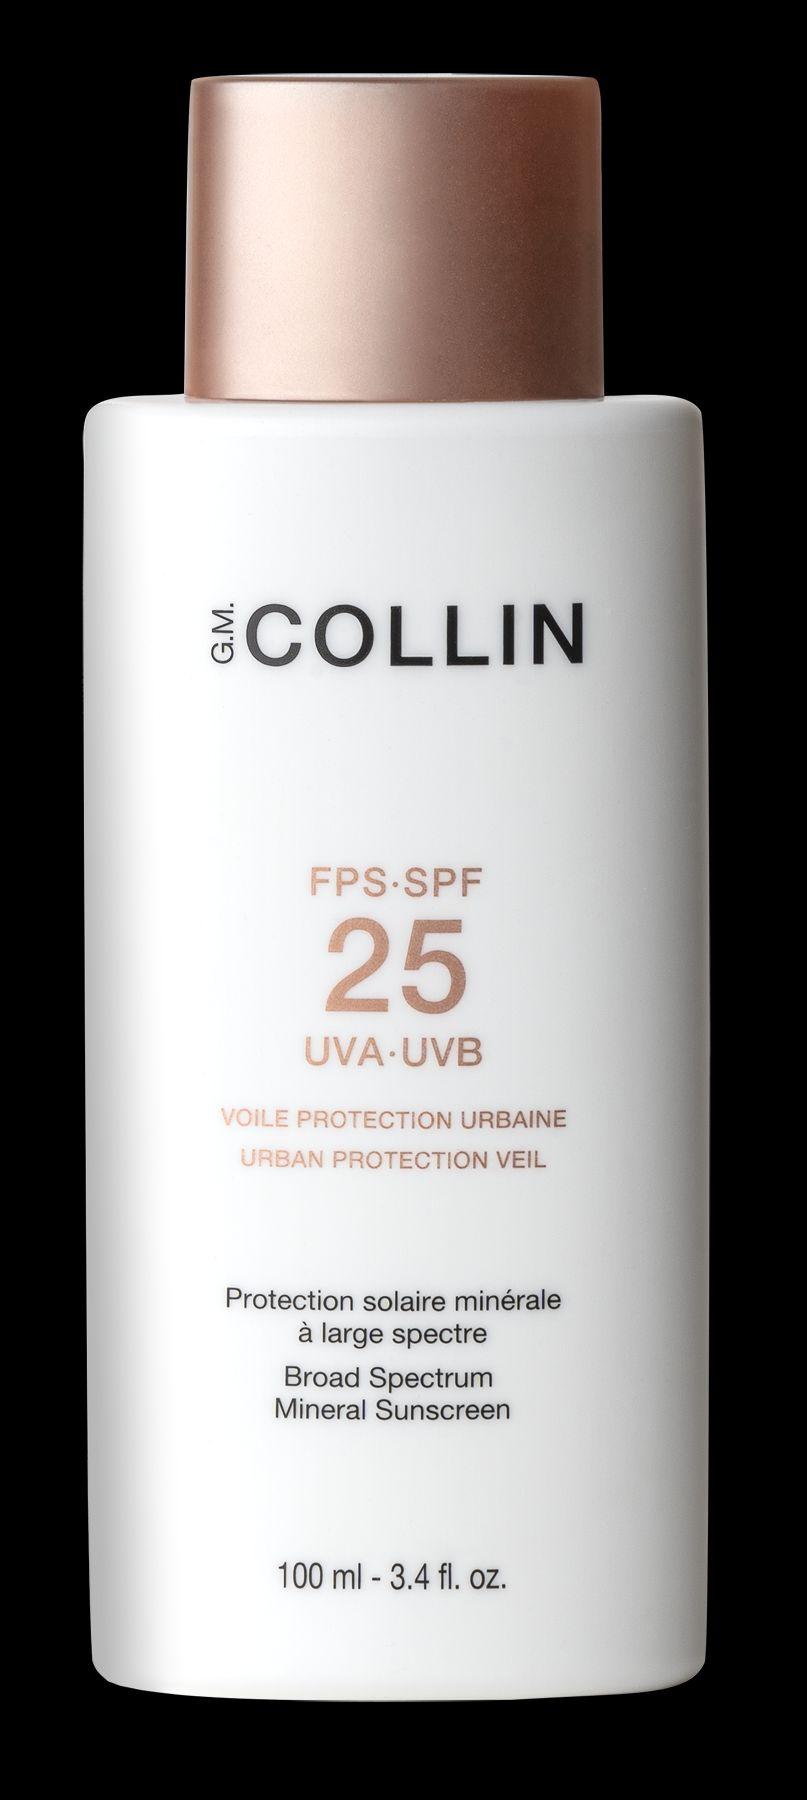 GM Collin SPF 25 broad spectrum sunscreen